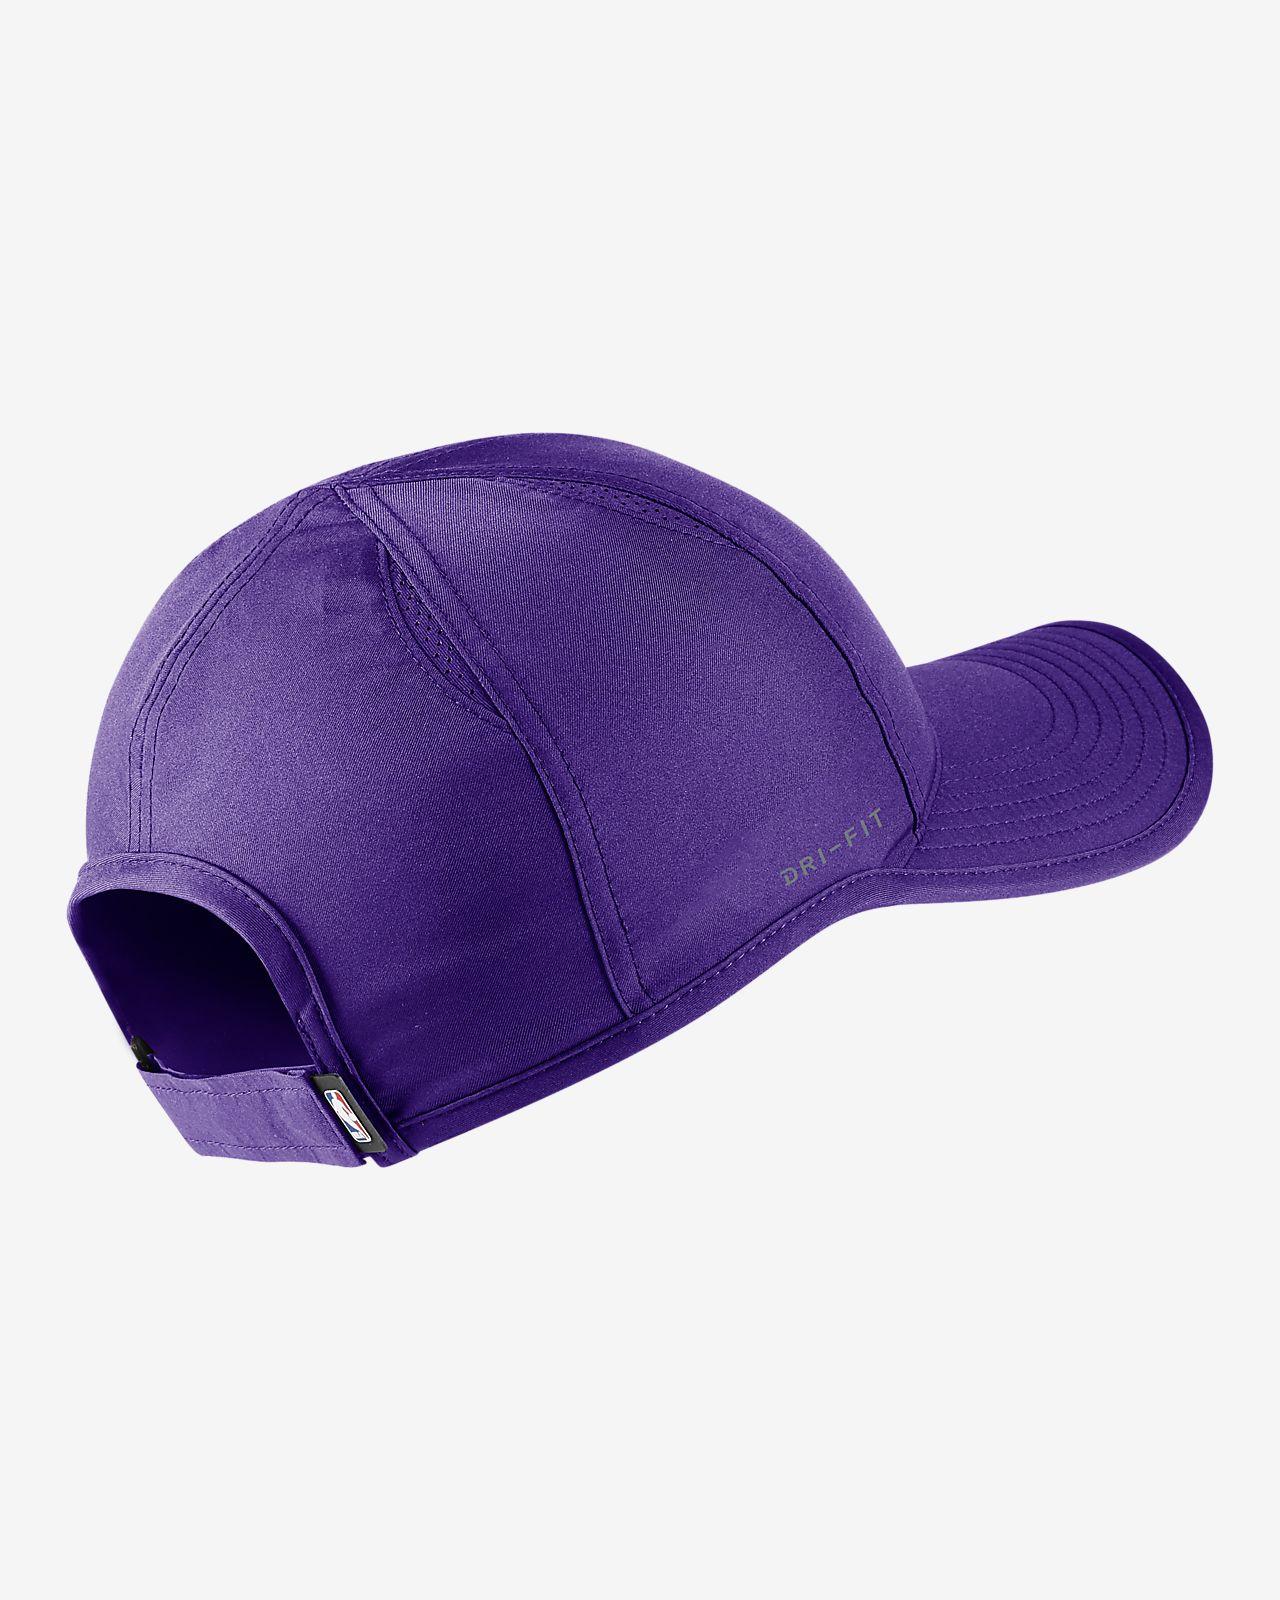 650ec6a6cb329 Los Angeles Lakers Nike AeroBill Featherlight NBA Hat. Nike.com